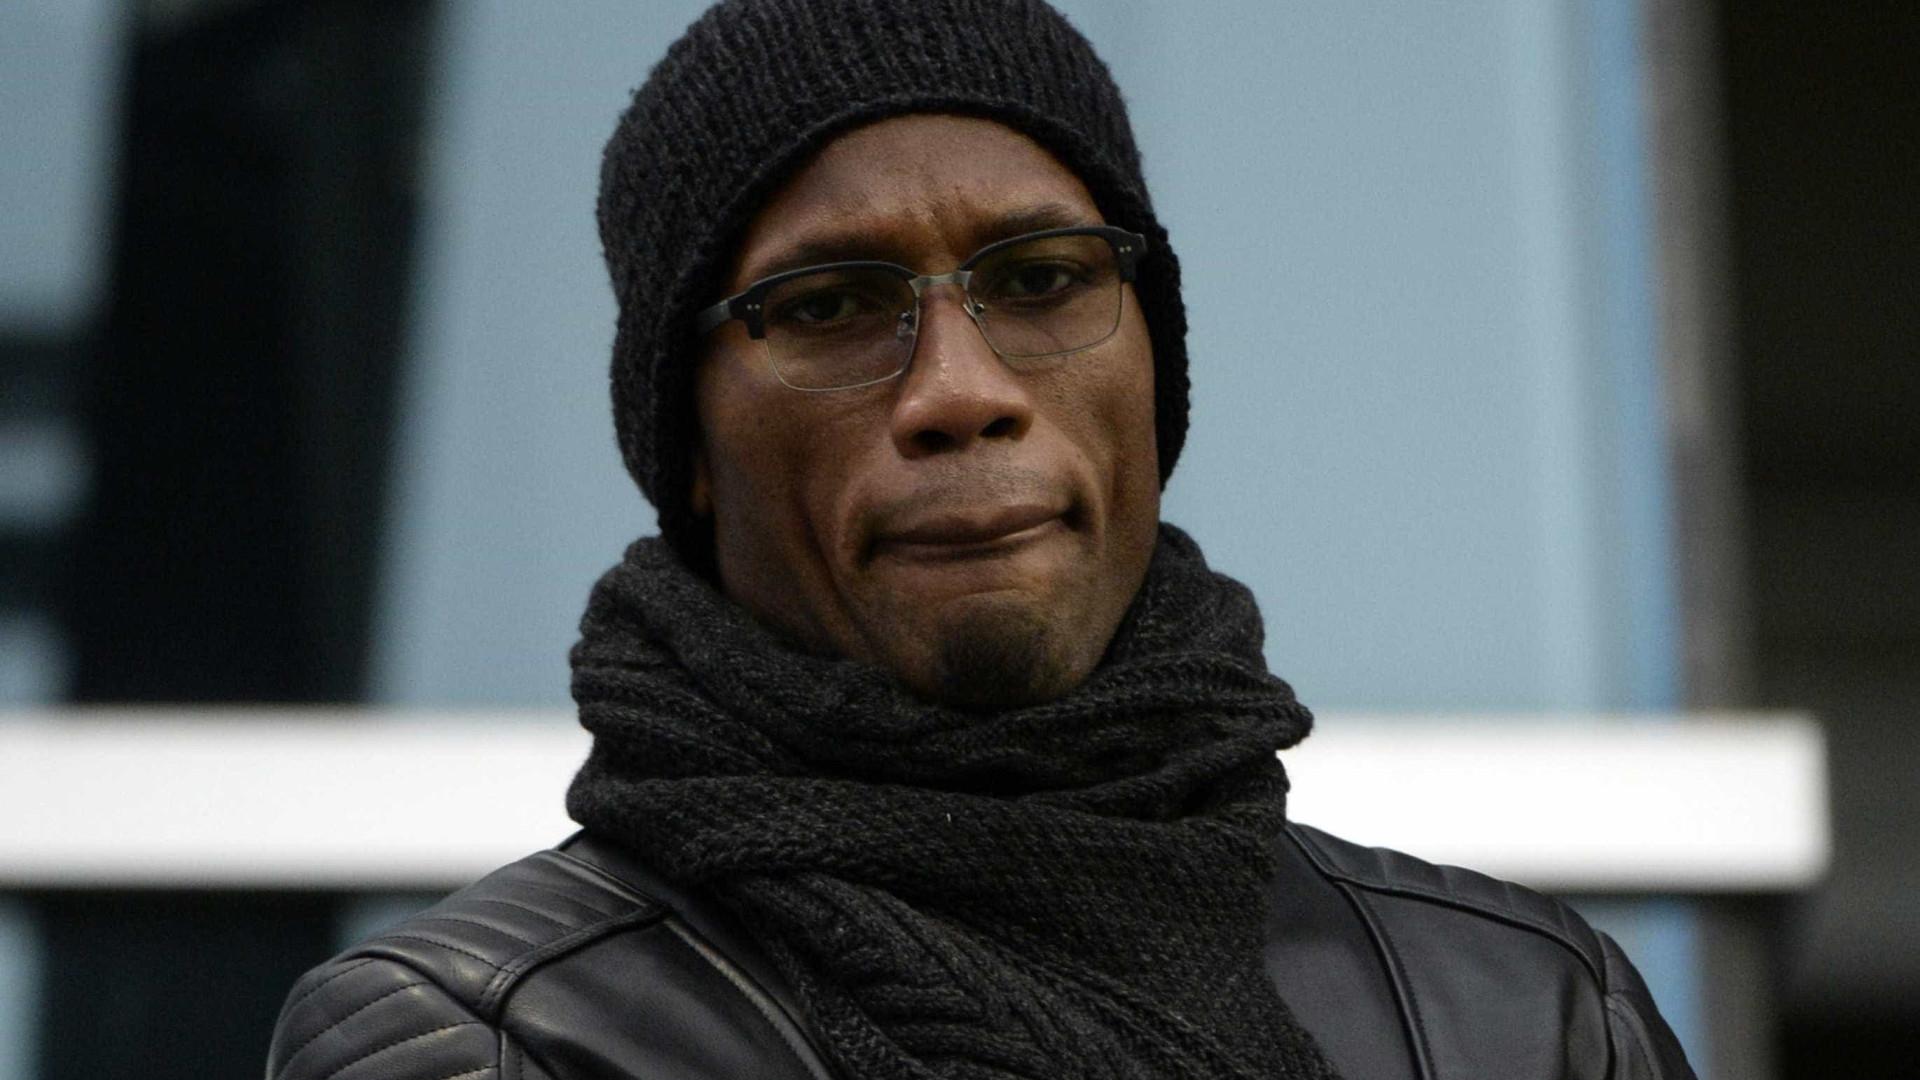 Drogba confirma aposentadoria do futebol aos 40 anos